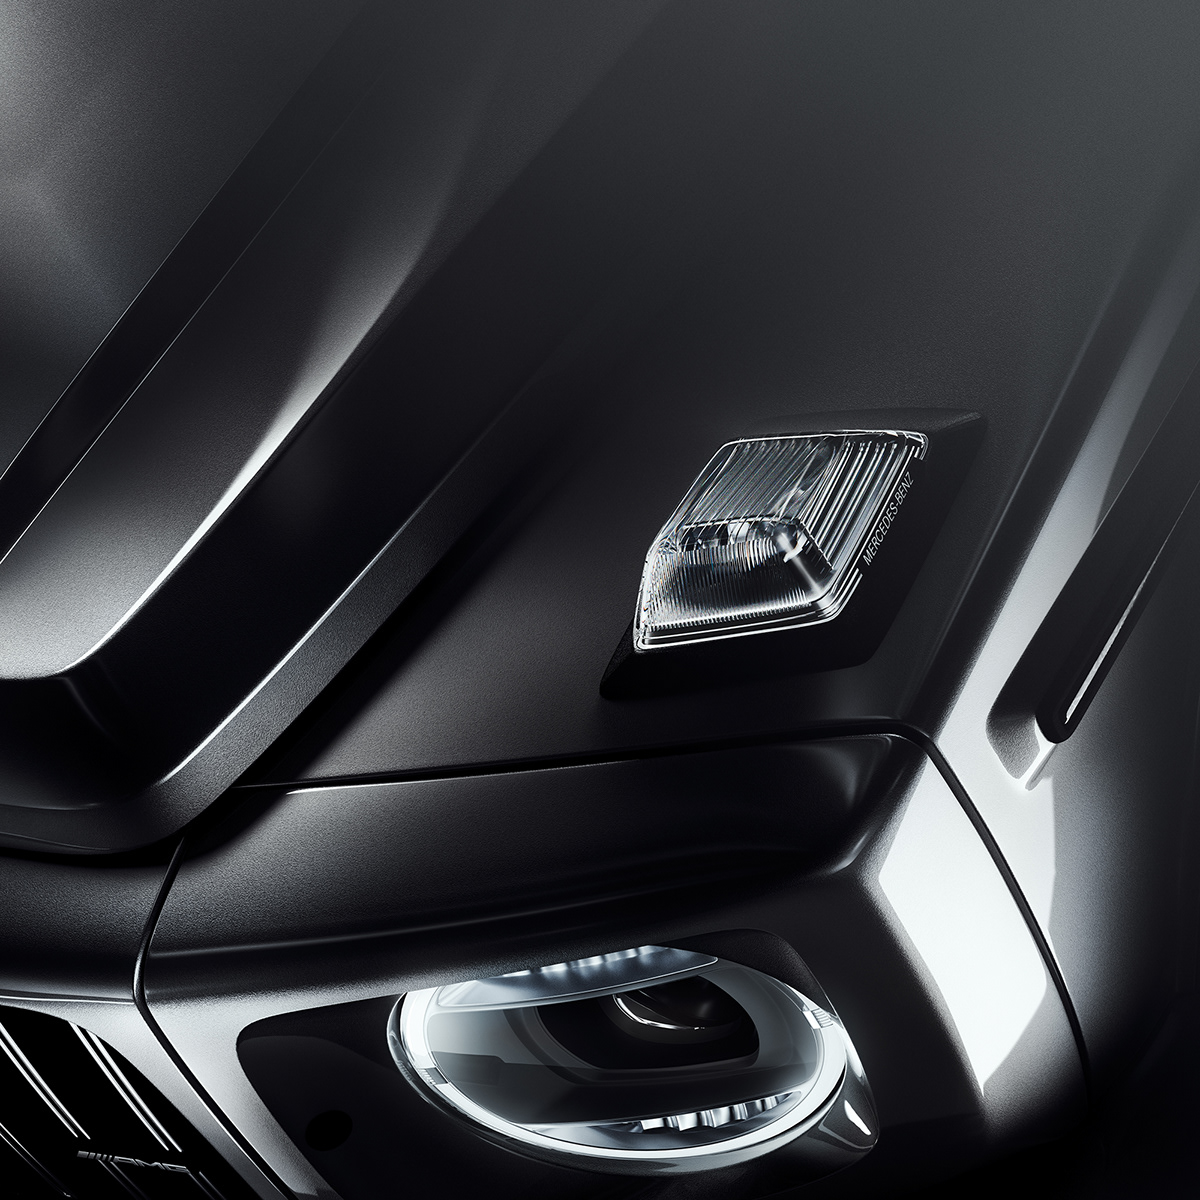 AMG,car,CGI,g class,guasch,mercedes,Photography